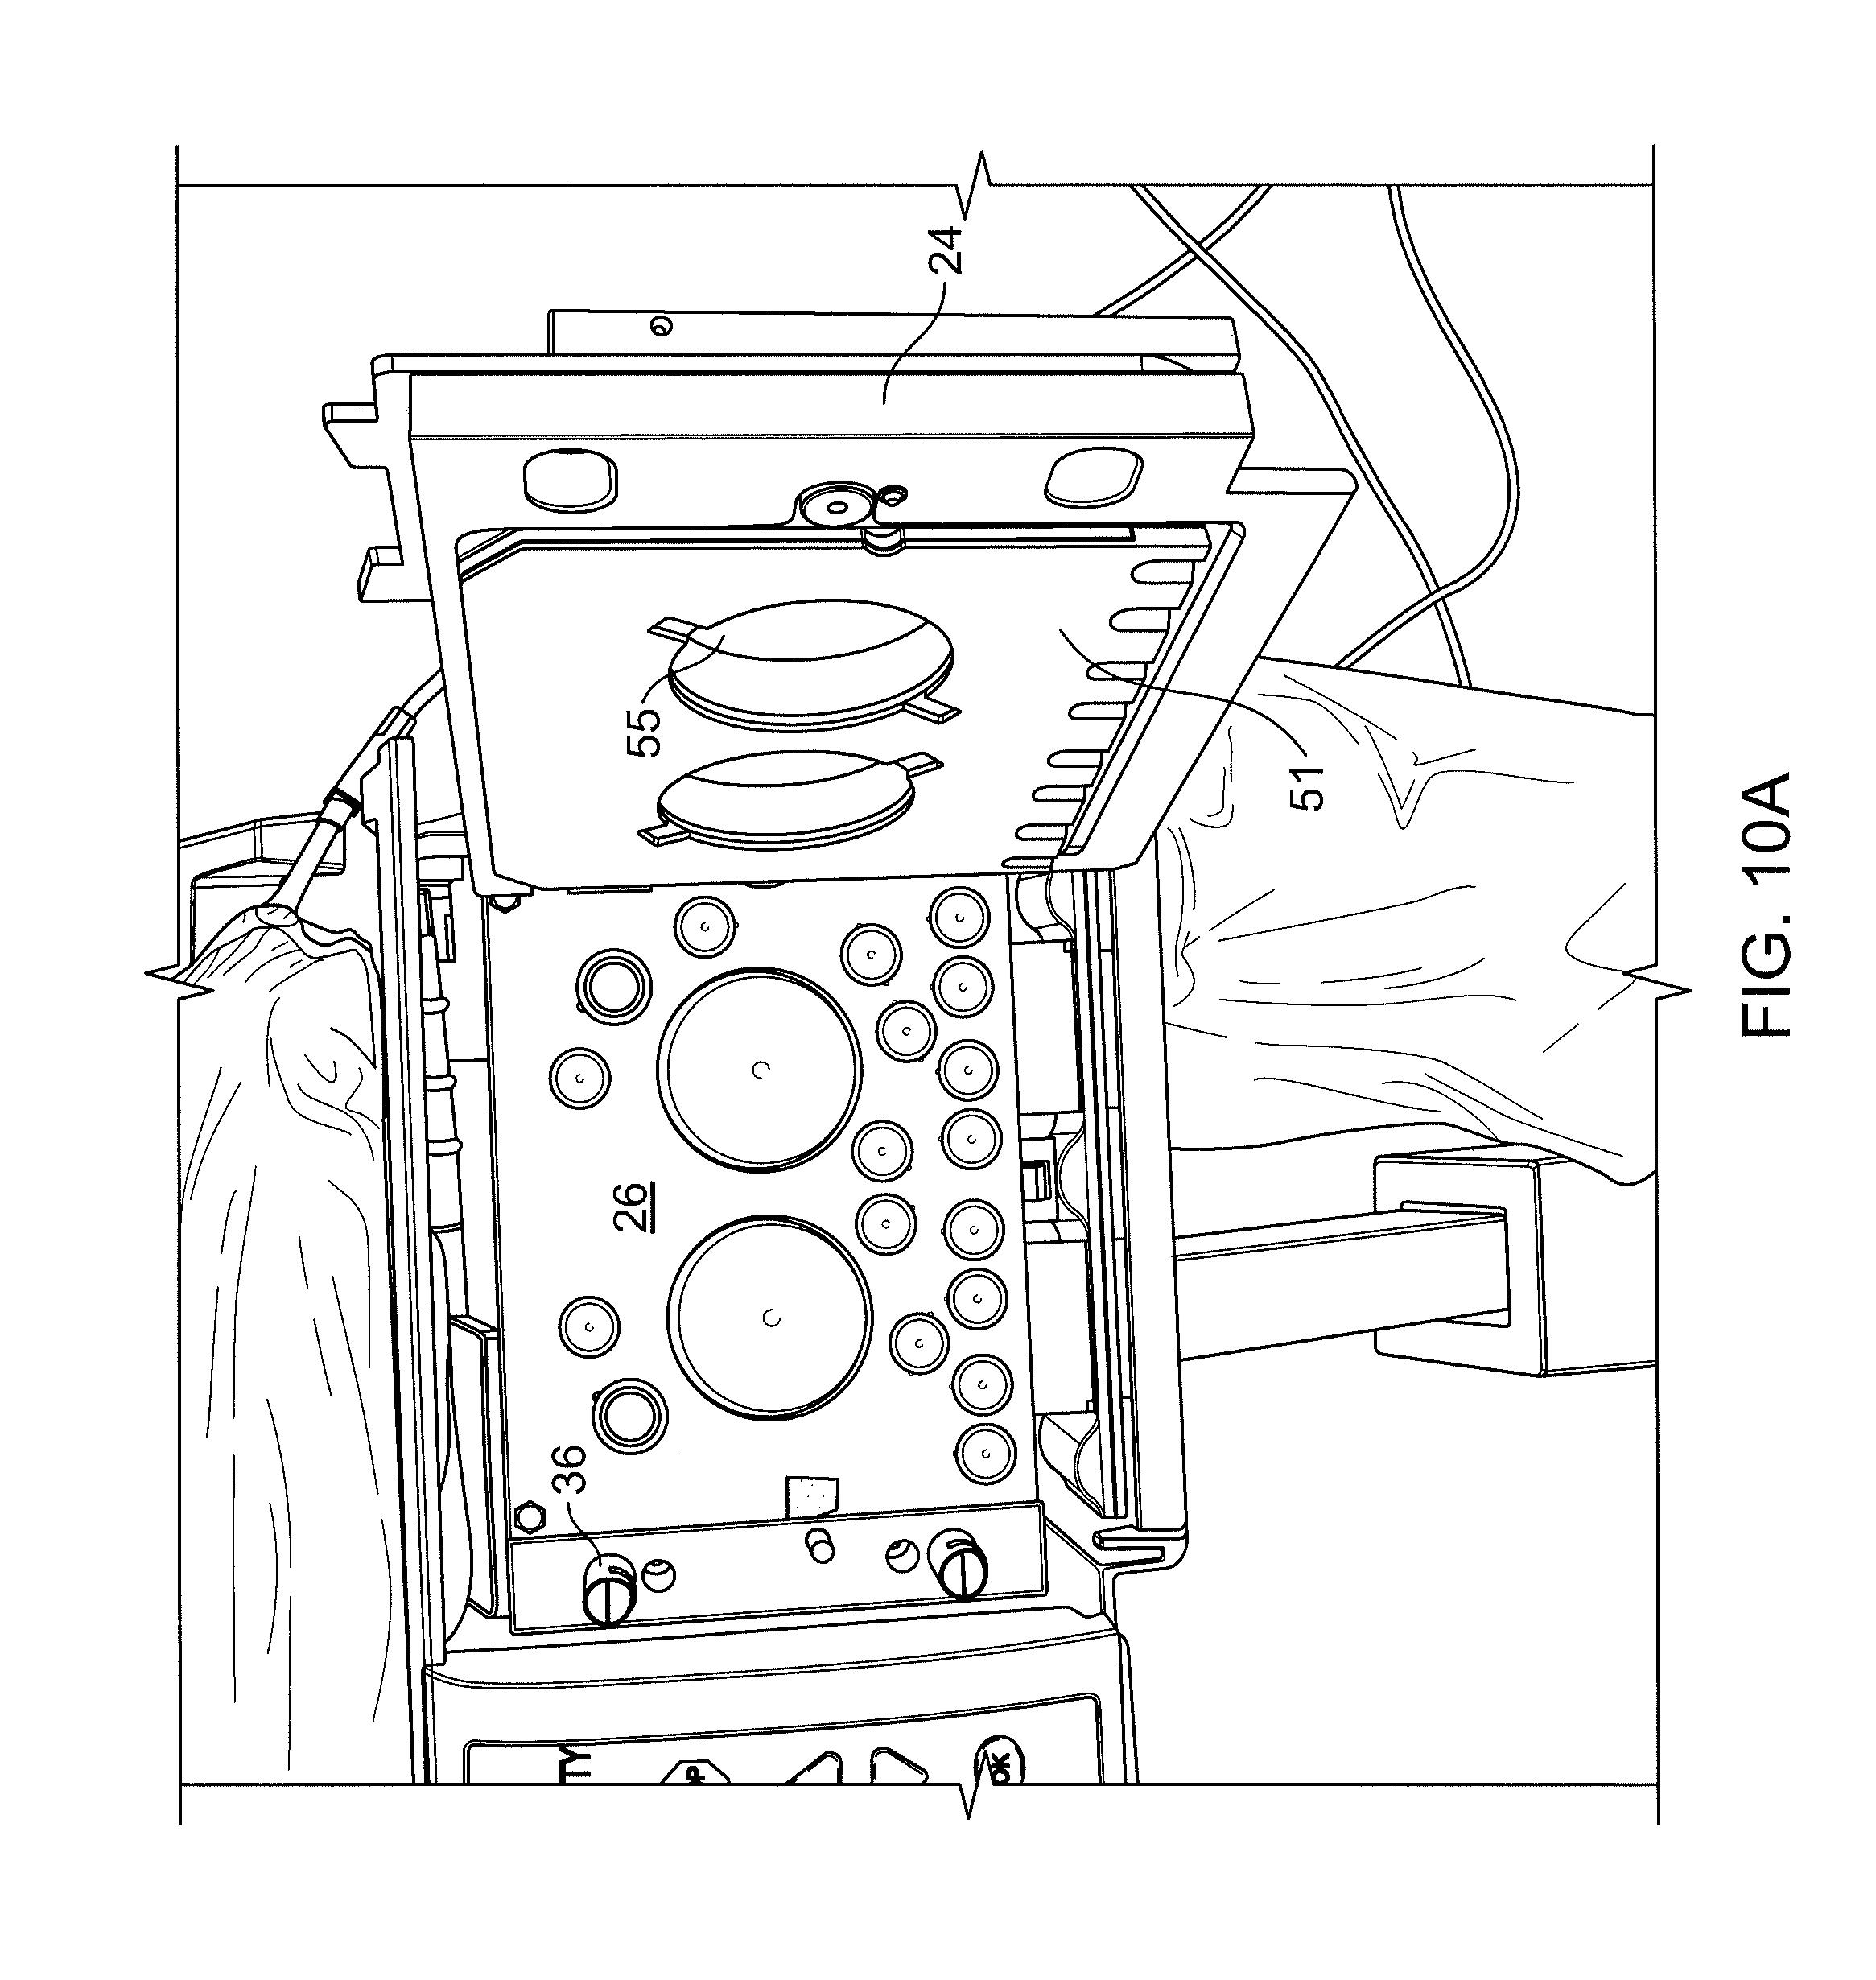 Patent Us 8784359 B2 Door Knob Touch Alarm Circuit Controlcircuit Diagram 0 Petitions